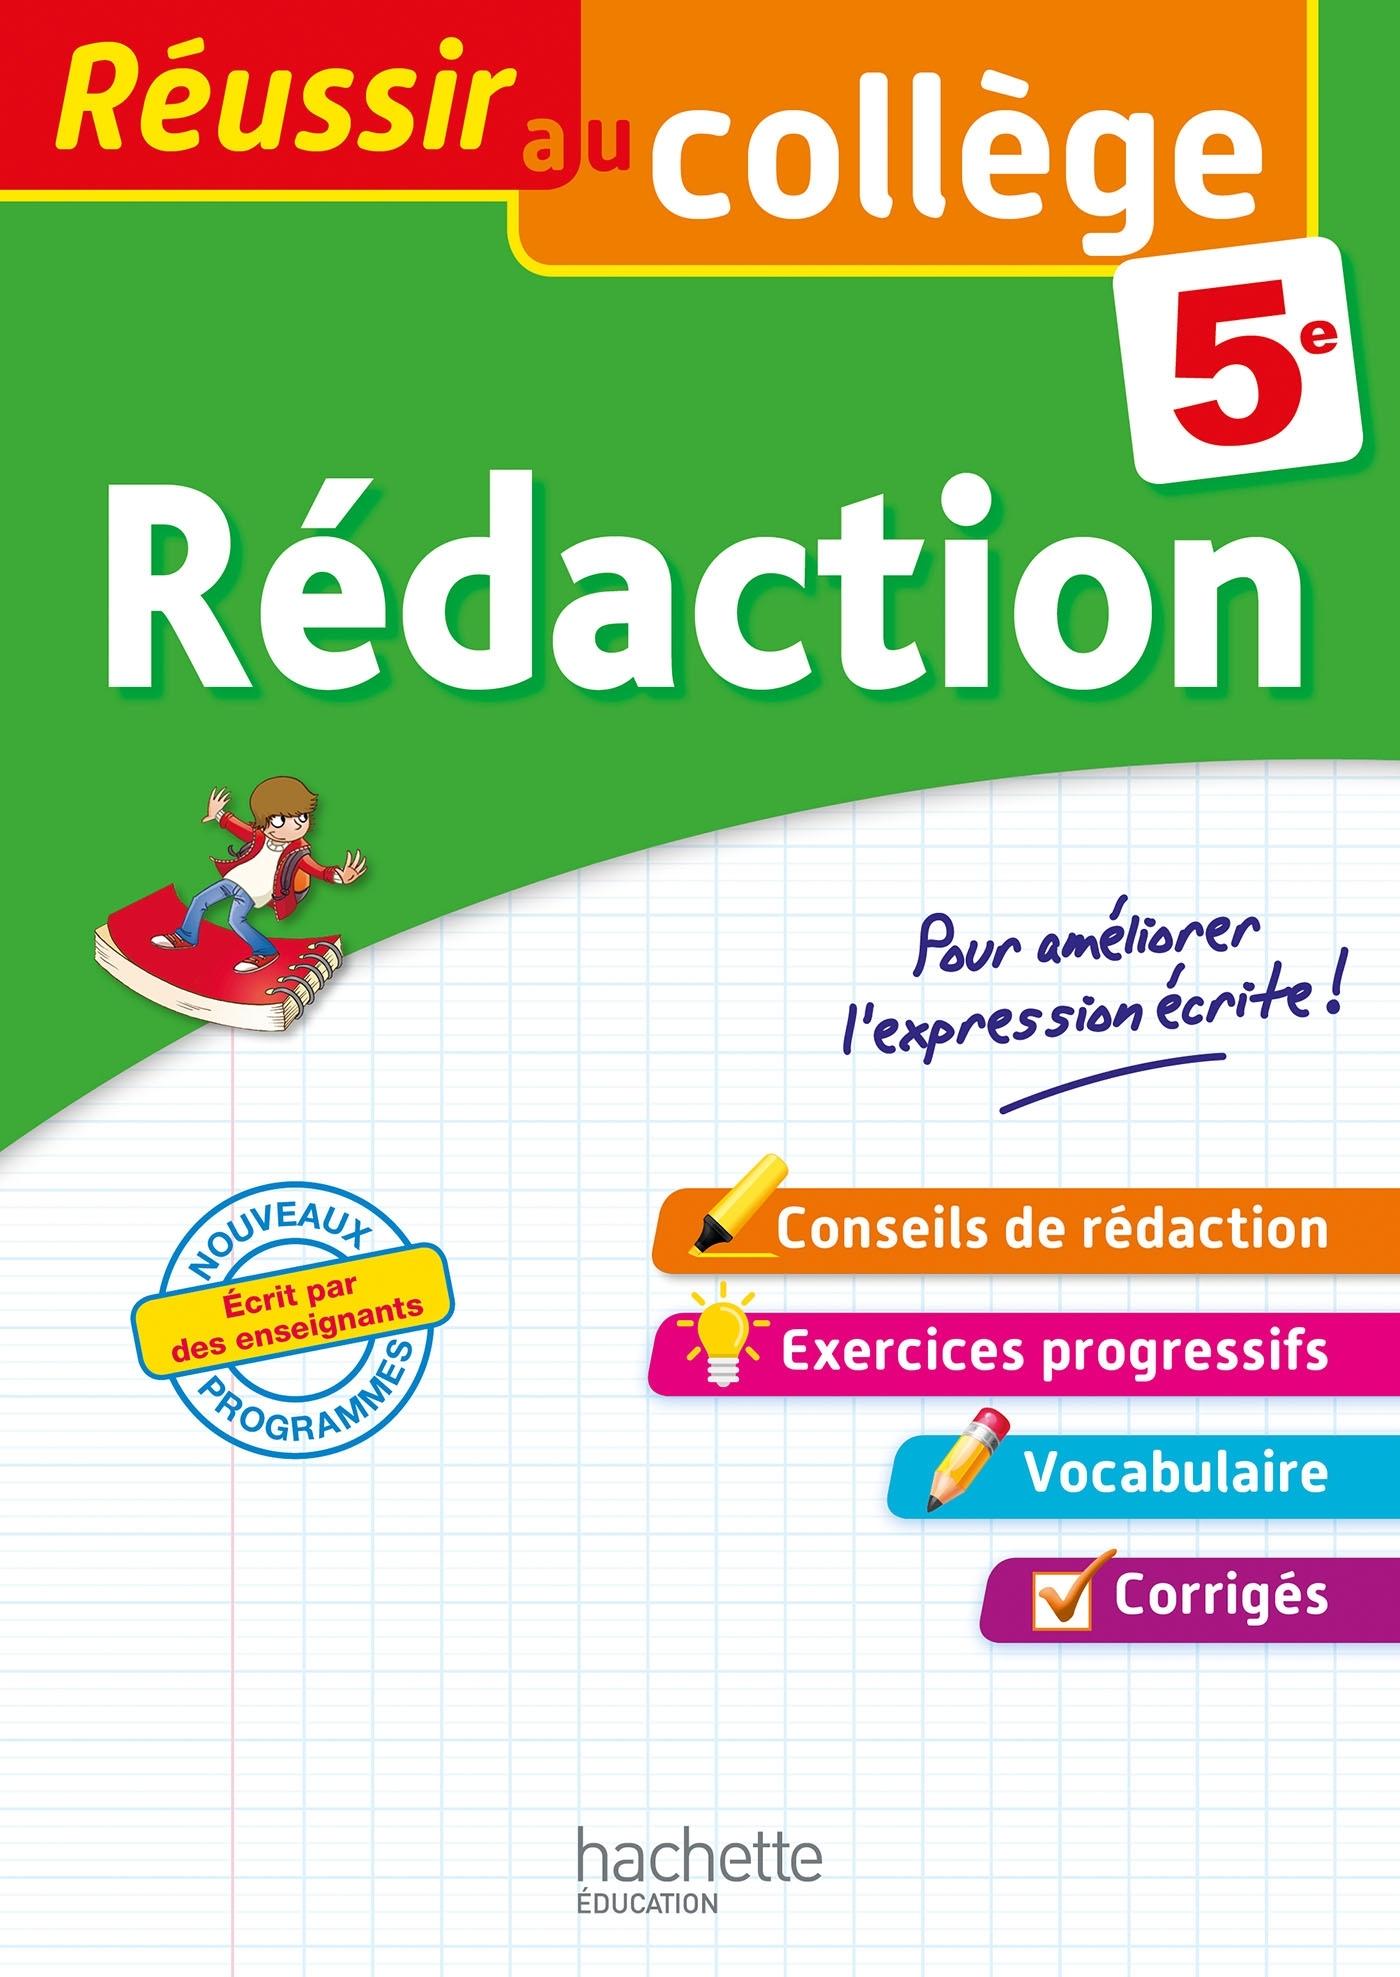 REUSSIR AU COLLEGE - REDACTION 5E